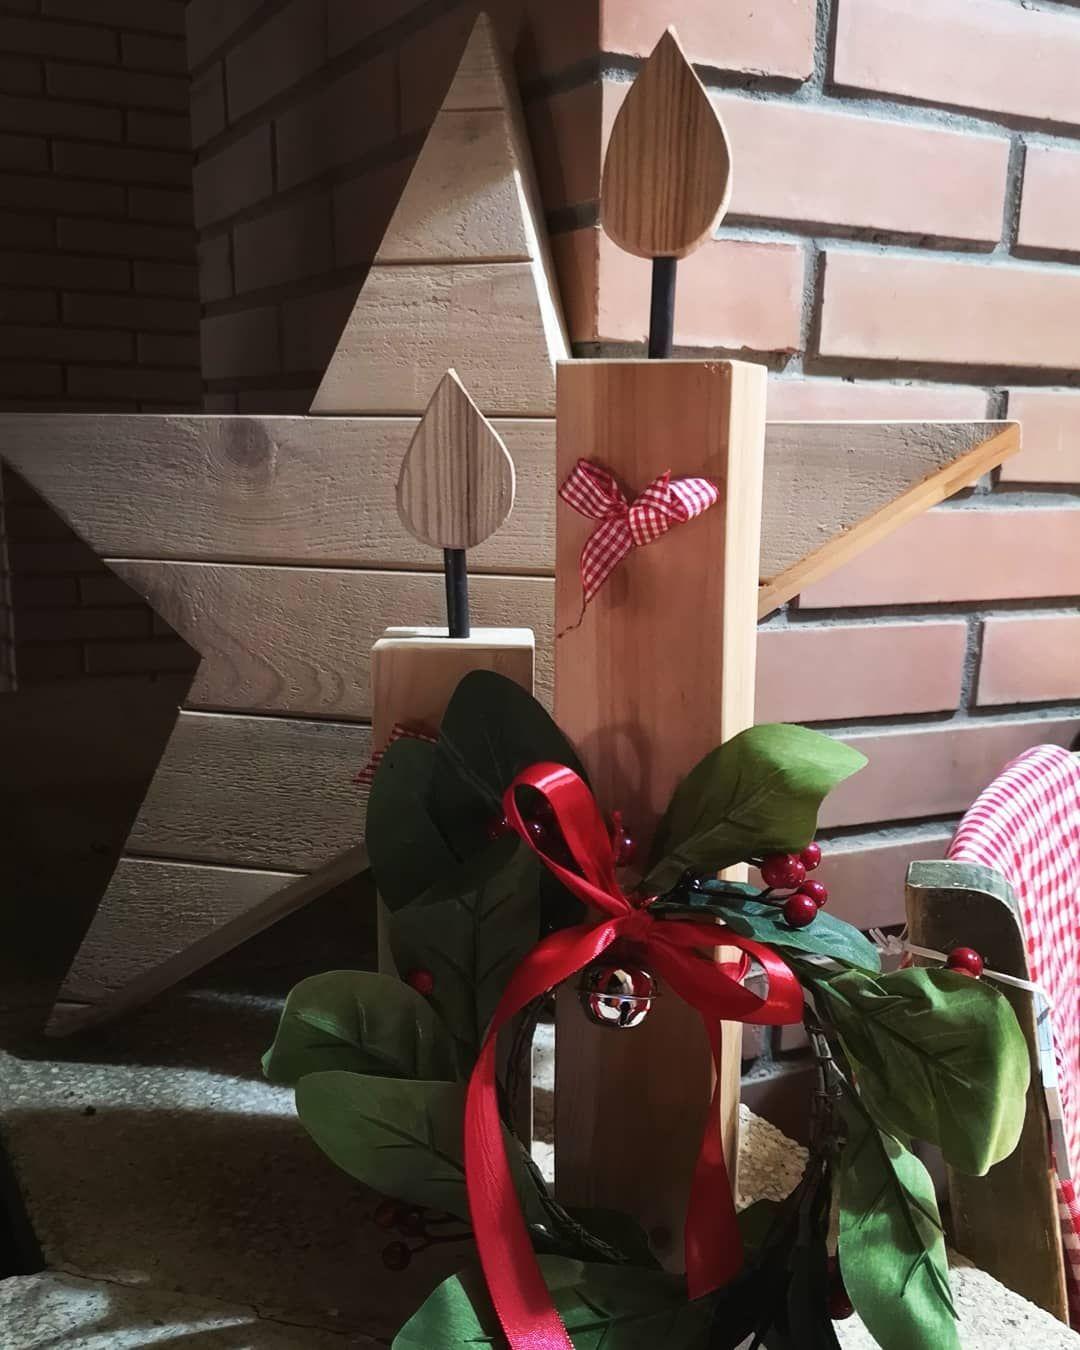 Christmas corner. - Christmas corner. ✨✨✨✨✨ #christmasdecor #christmas #christmastime #christmasmagic #christmastree #christmaslights #seasonaldecor #instachristmas #wooddecorations #wood#pallet #handmade #reciclyng #artists#xmas #xmastime #xmastree #xmasdecor #joy#santa #hohoho #navidad#rustico#christmasandles #stars.     Informations About Christmas corner.                      Pin     You can easily use my profile to examine different pin types. Christmas corner.                      pins ar